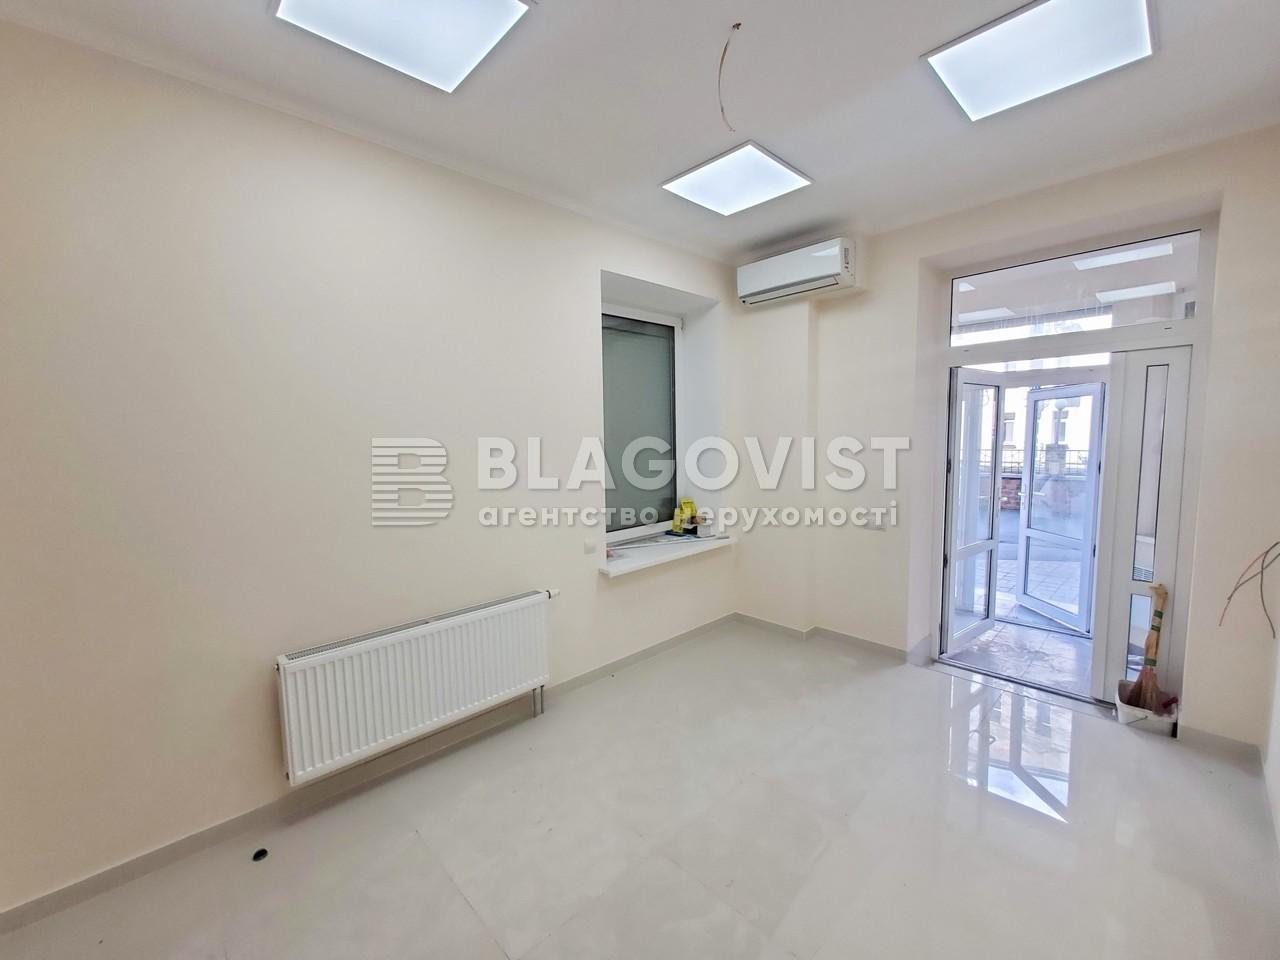 Офис, Дмитриевская, Киев, E-41063 - Фото 14